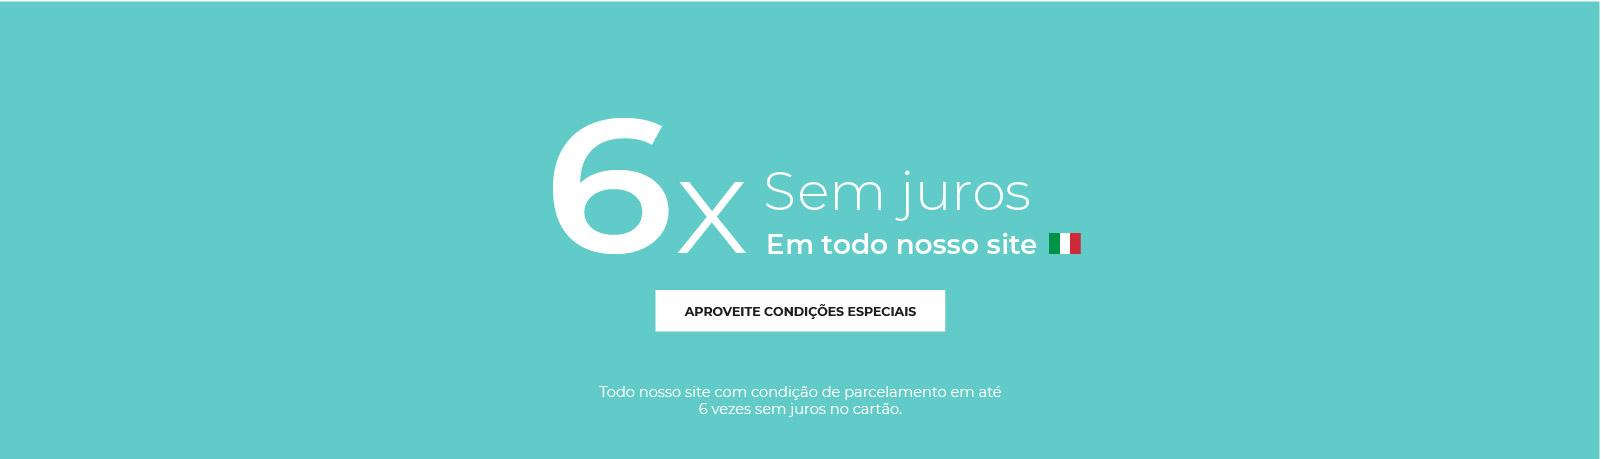 1 - 6X SEM JUROS MOBILE